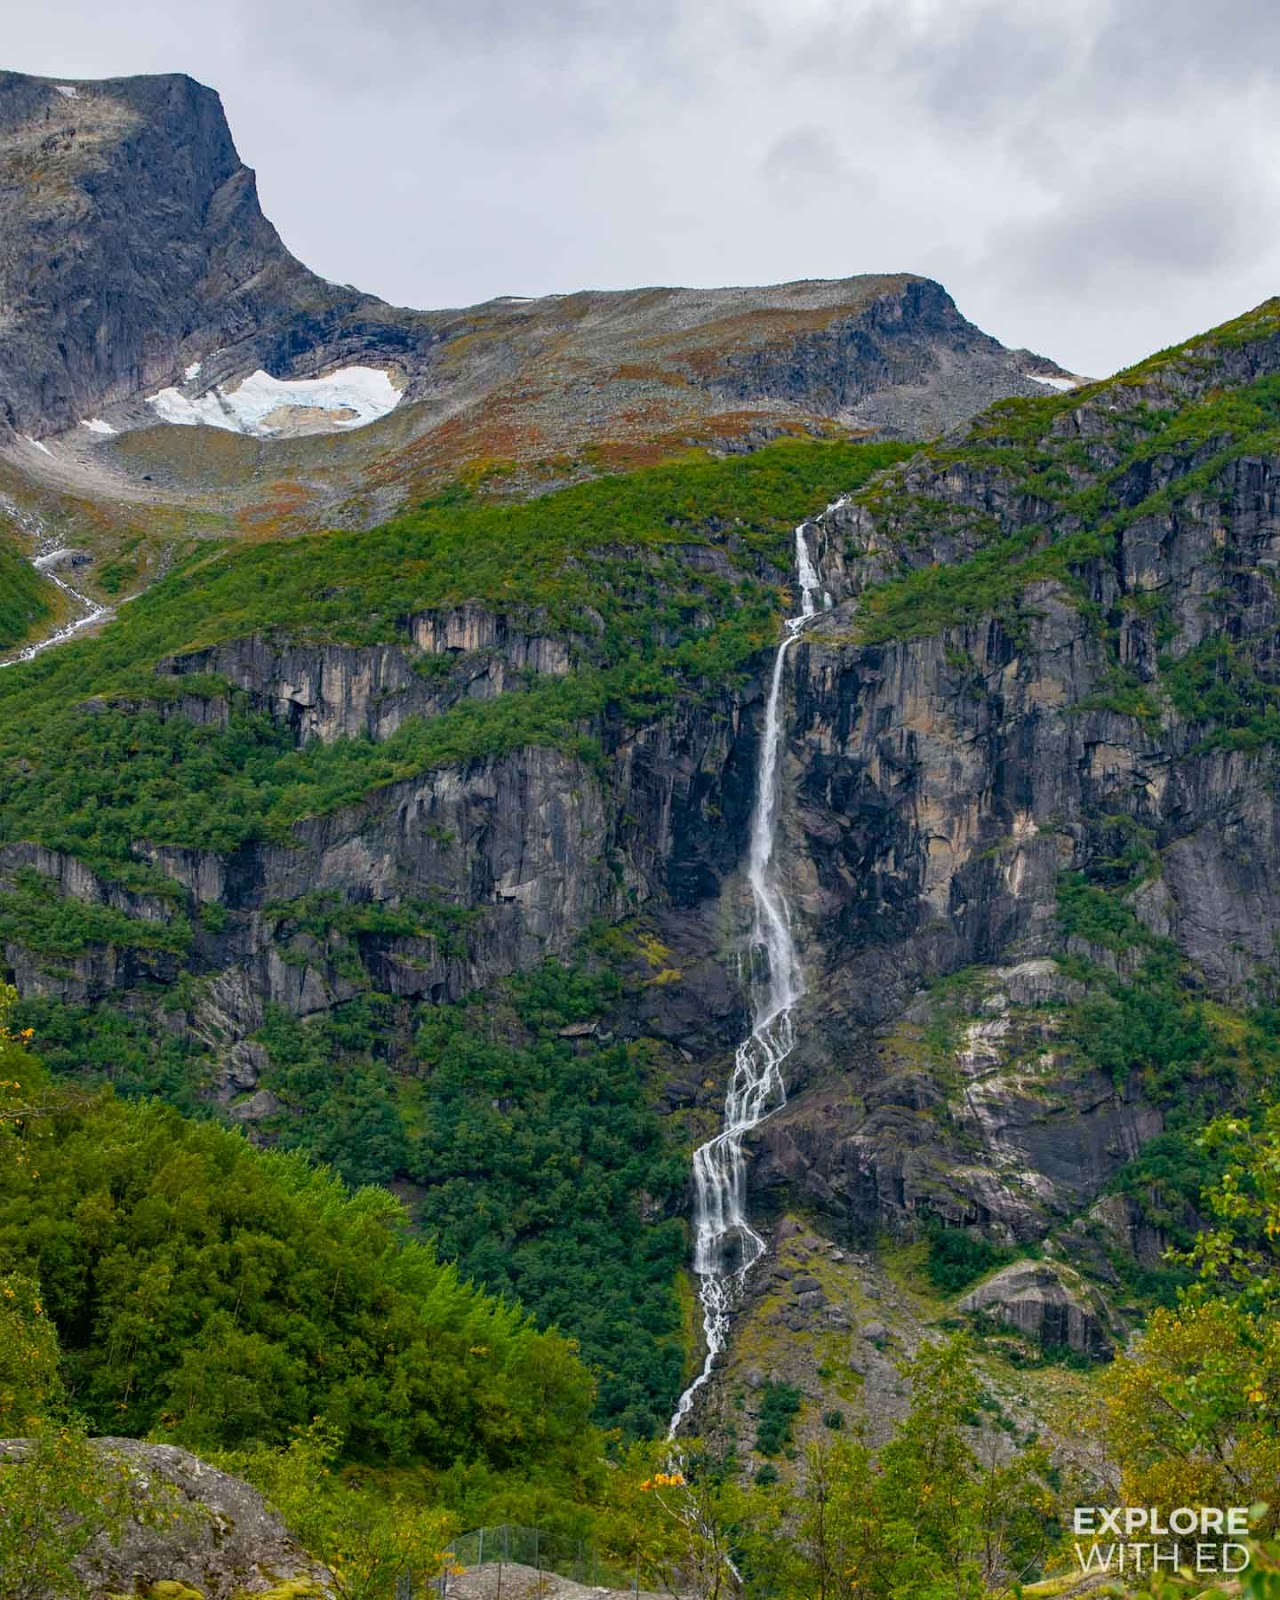 The Jurassic landscape of Jostedalsbreen National Park near Briksdal Glacier